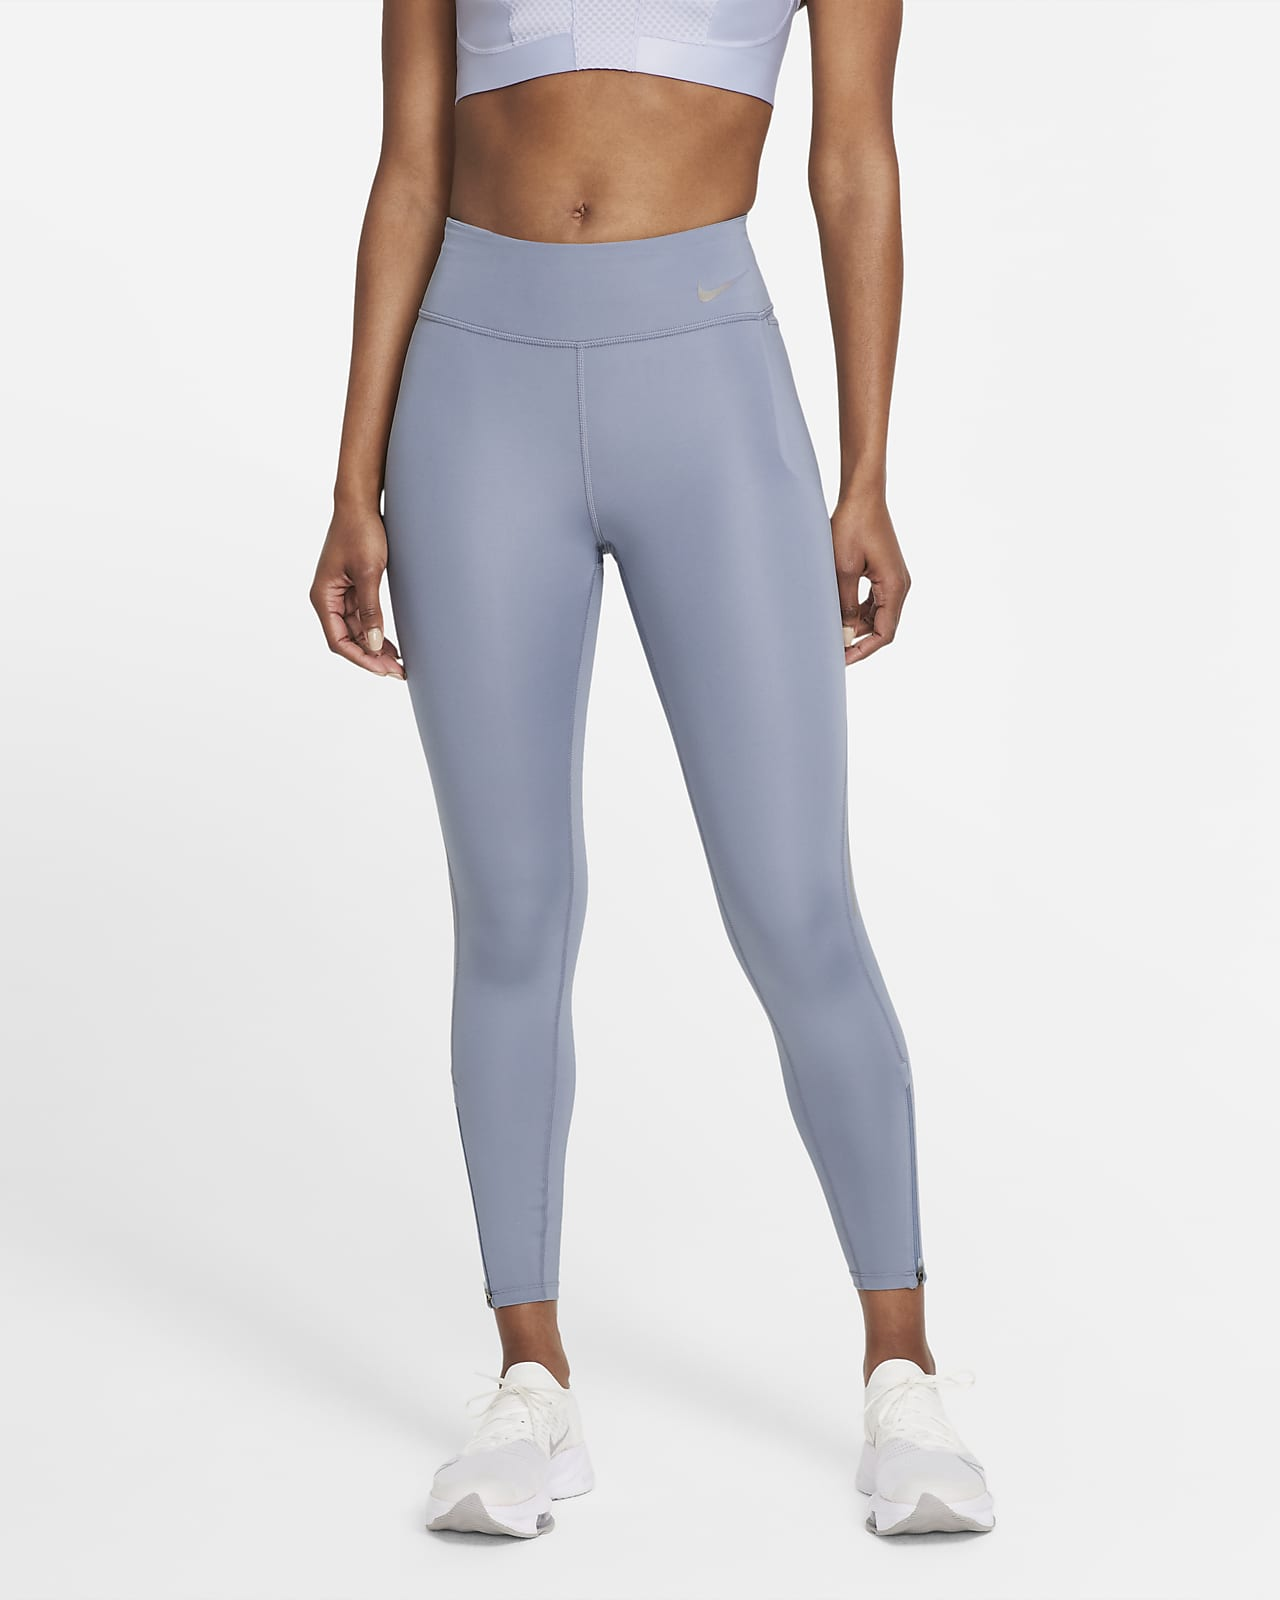 Leggings de running a 7/8 Nike Epic Faster para mulher